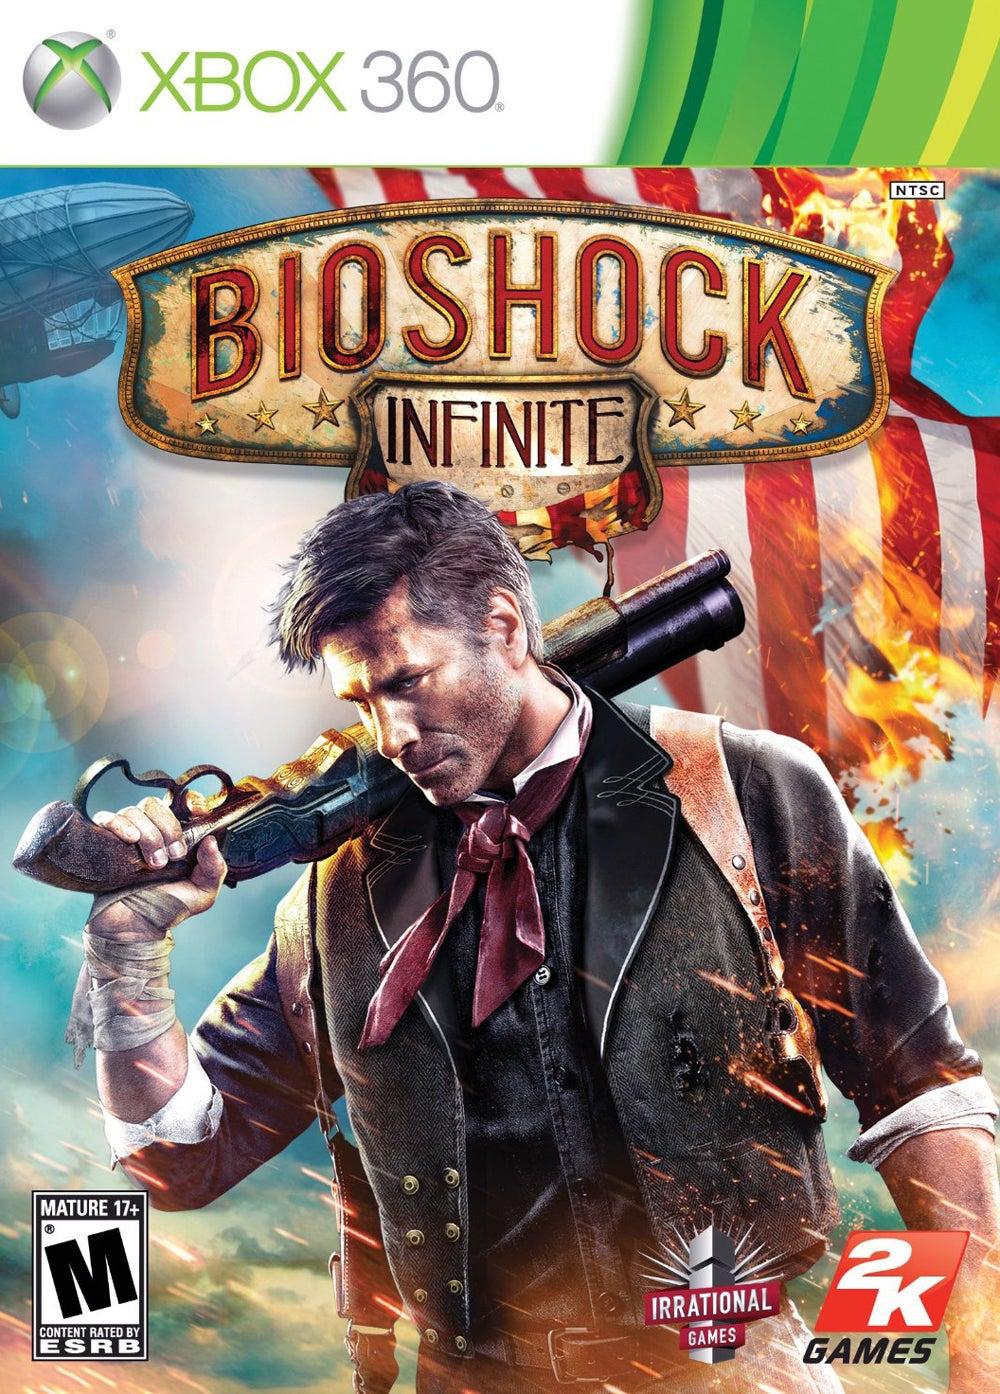 BioShock Infinite Xbox 360 IGN